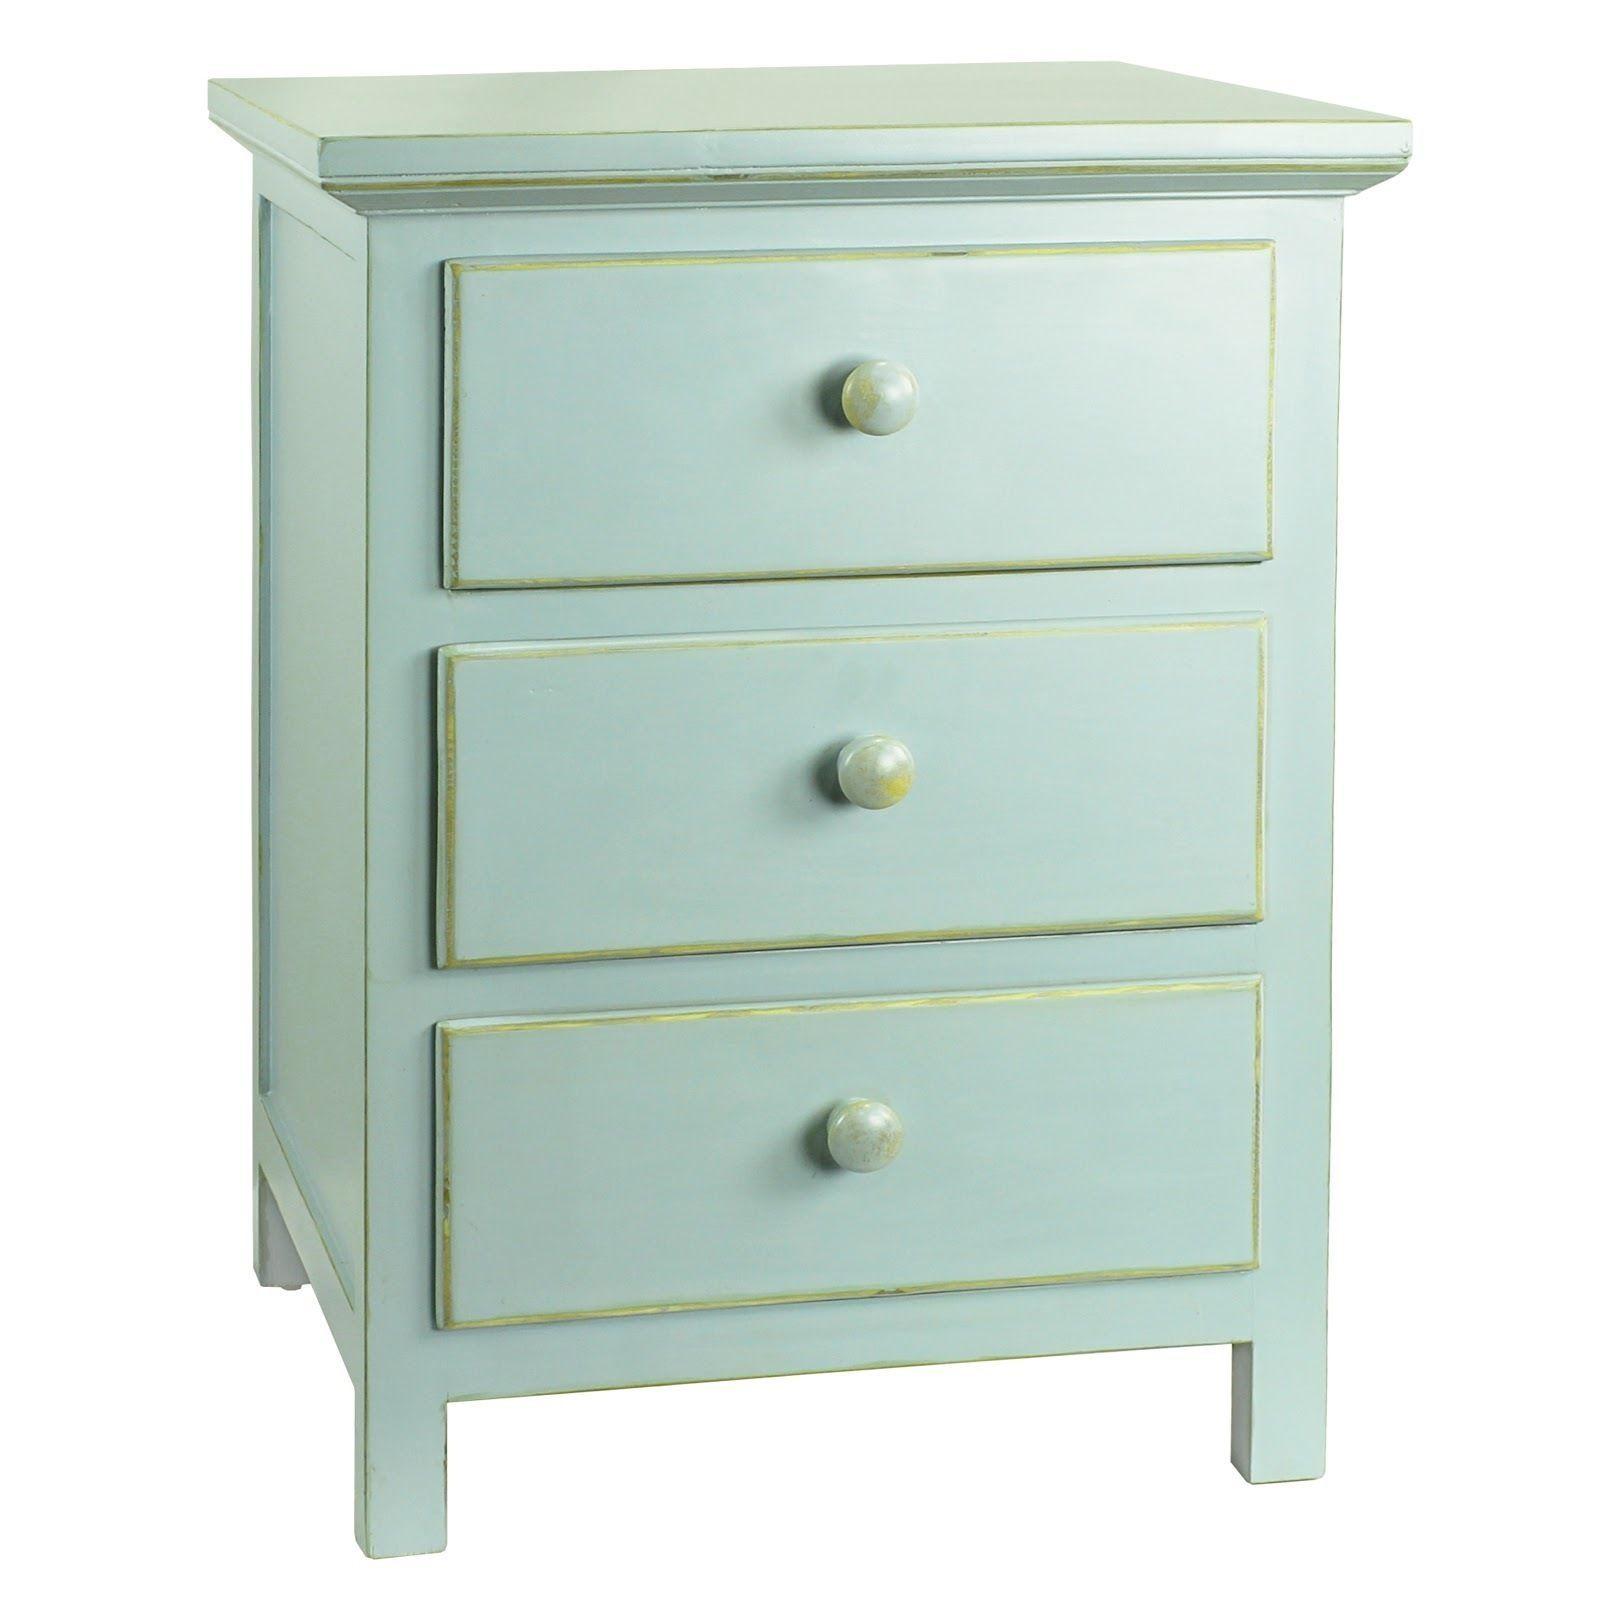 Evelynn drawer dresser overstock shopping great deals on